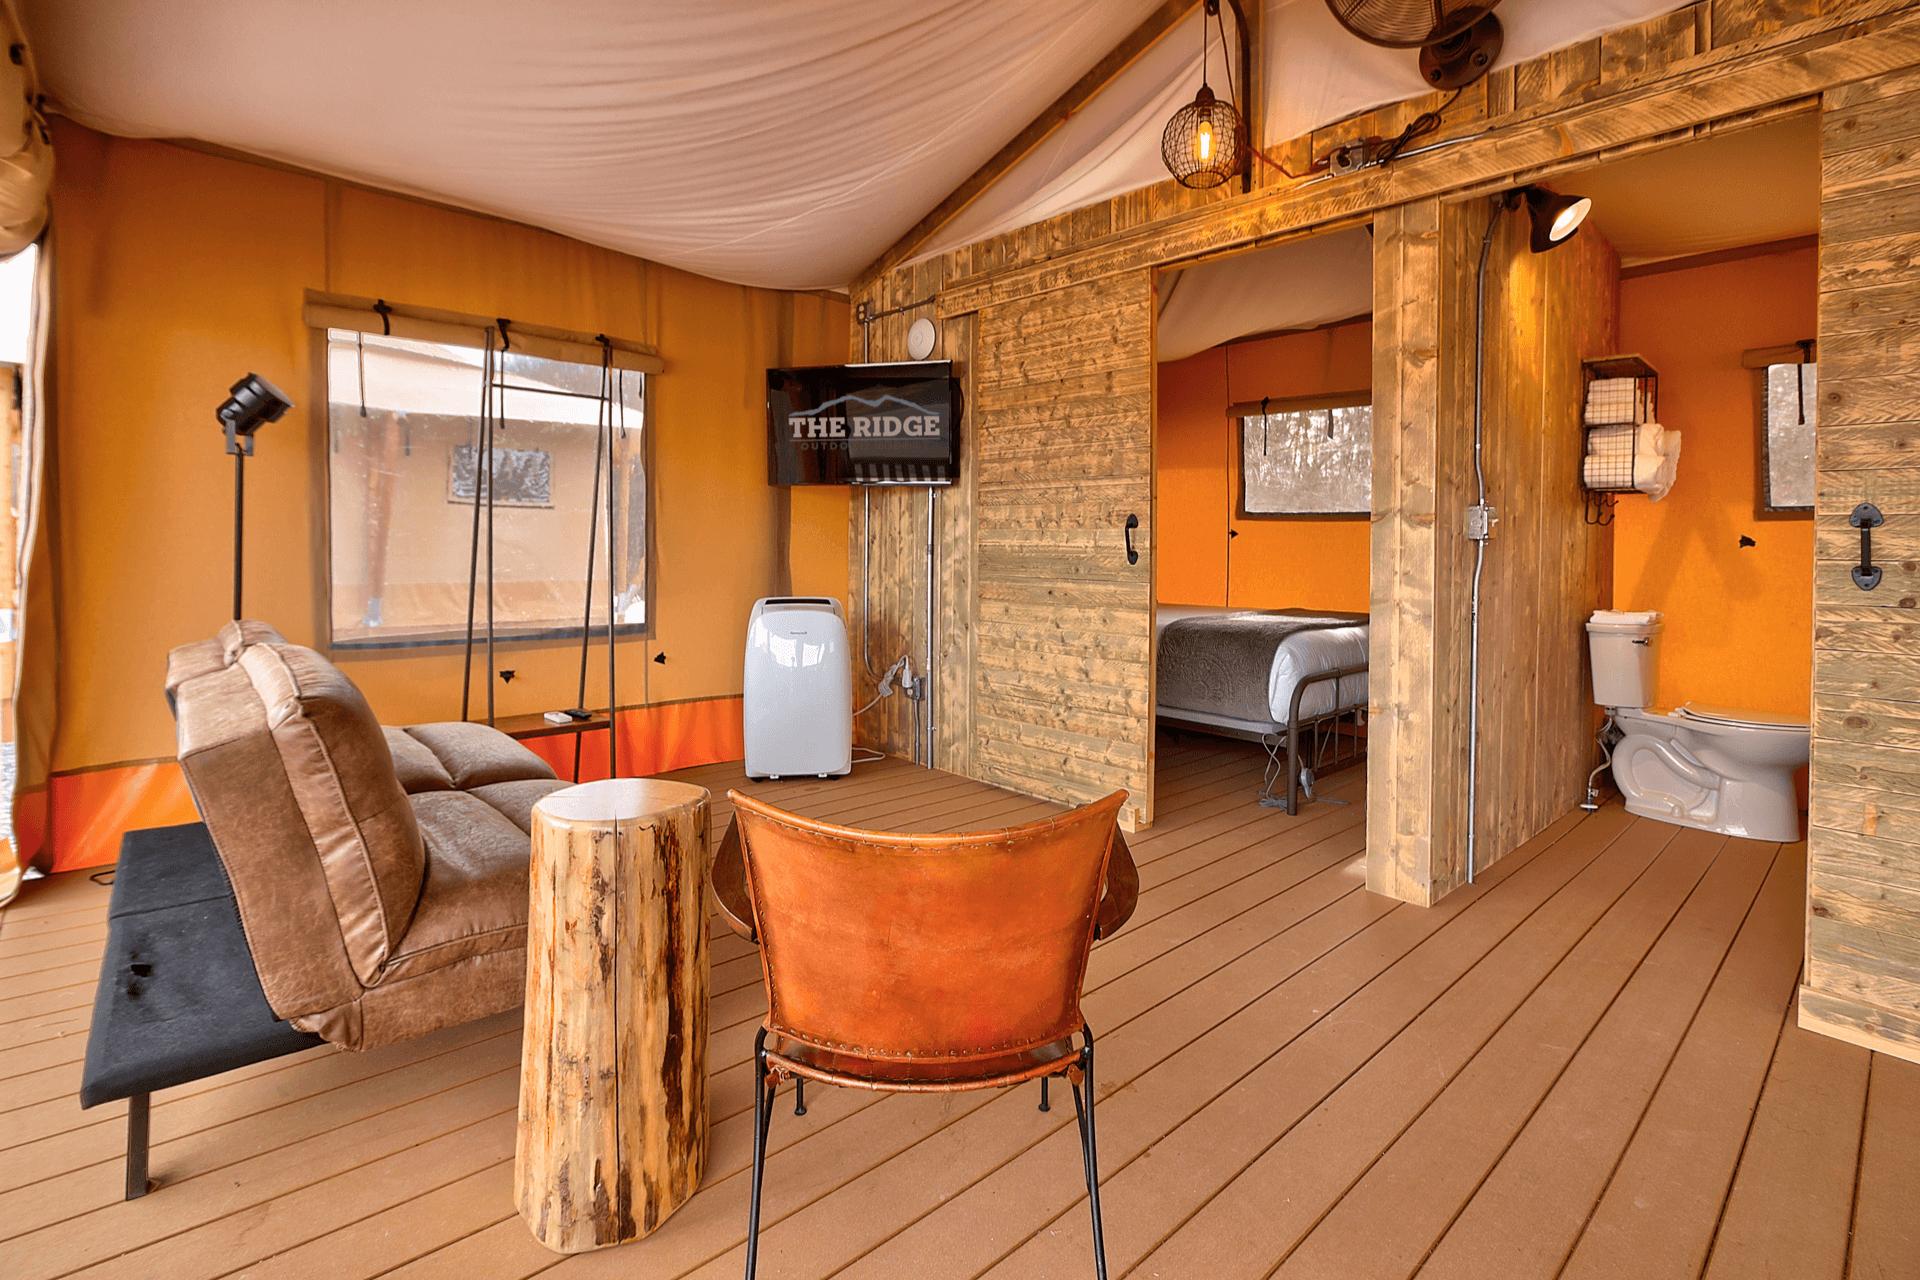 The Ridge Outdoor Resort Sevierville Tennessee (3) (1)